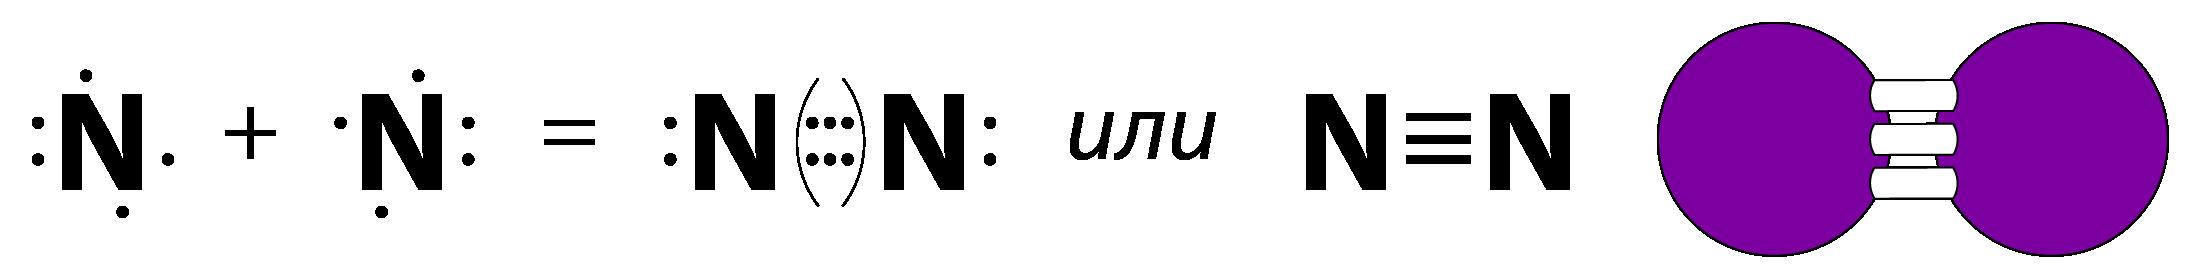 Молекула азота двухатомная